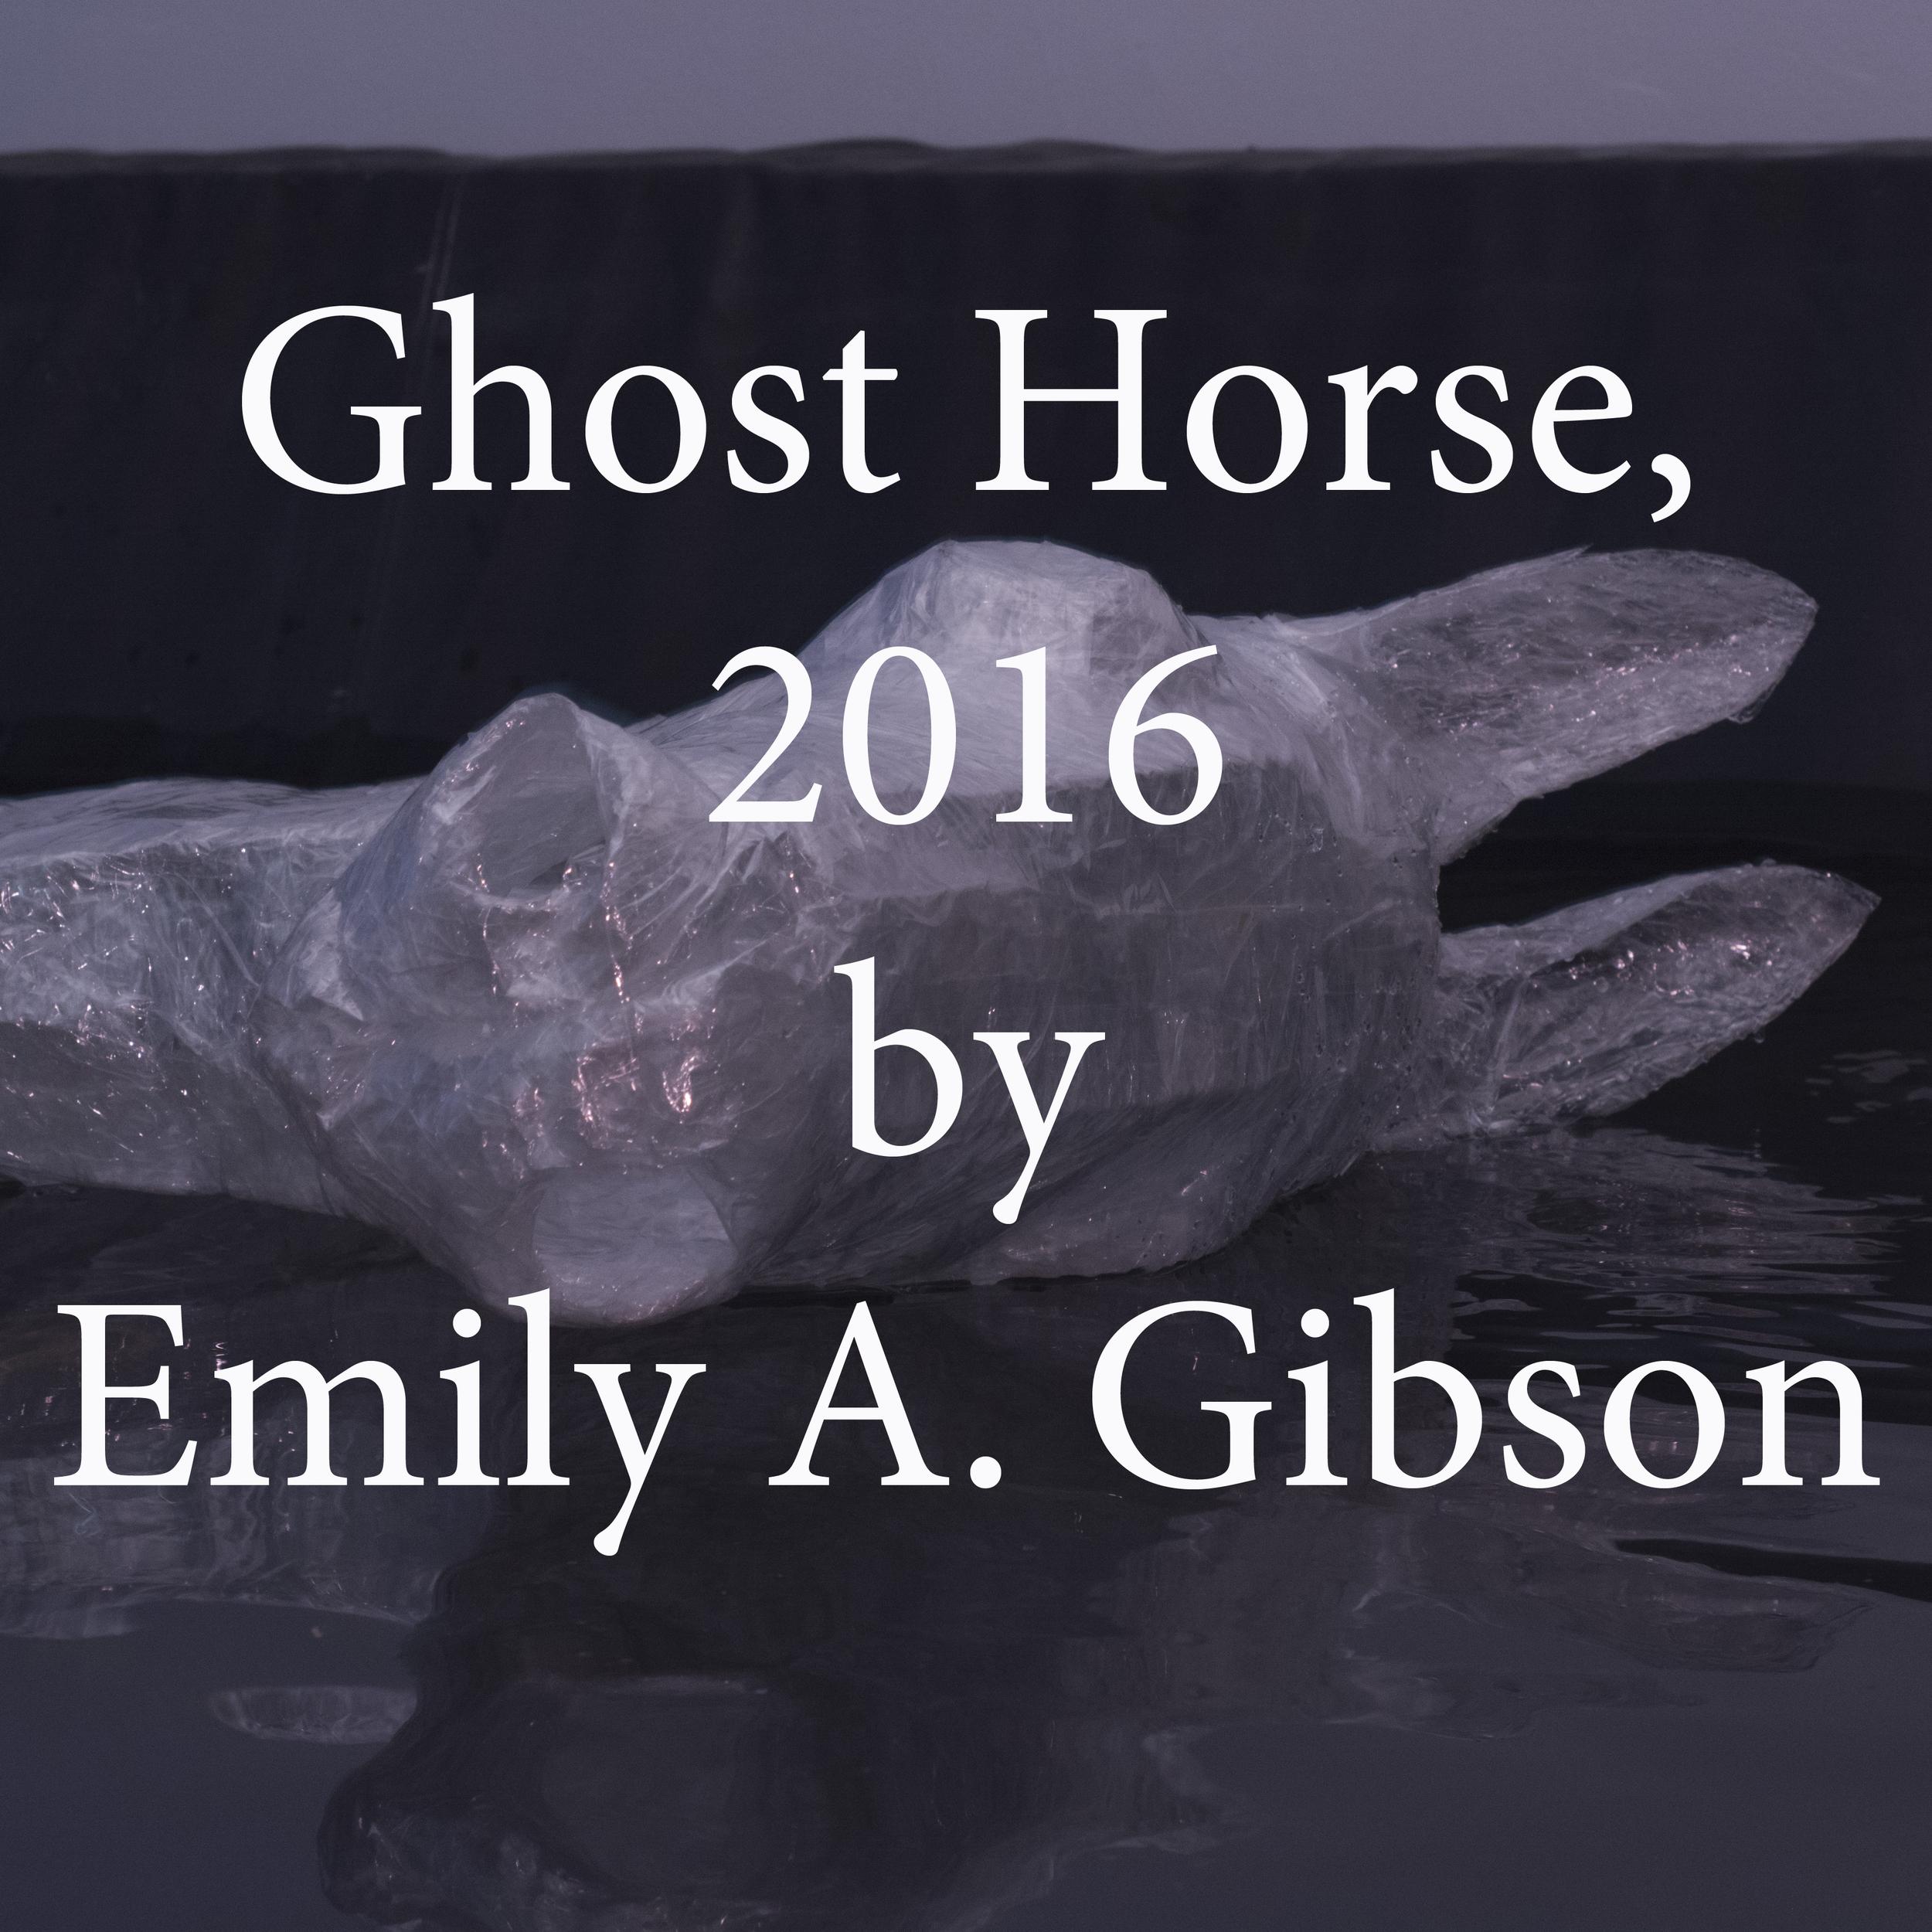 ghost horse emily a gibson.jpg